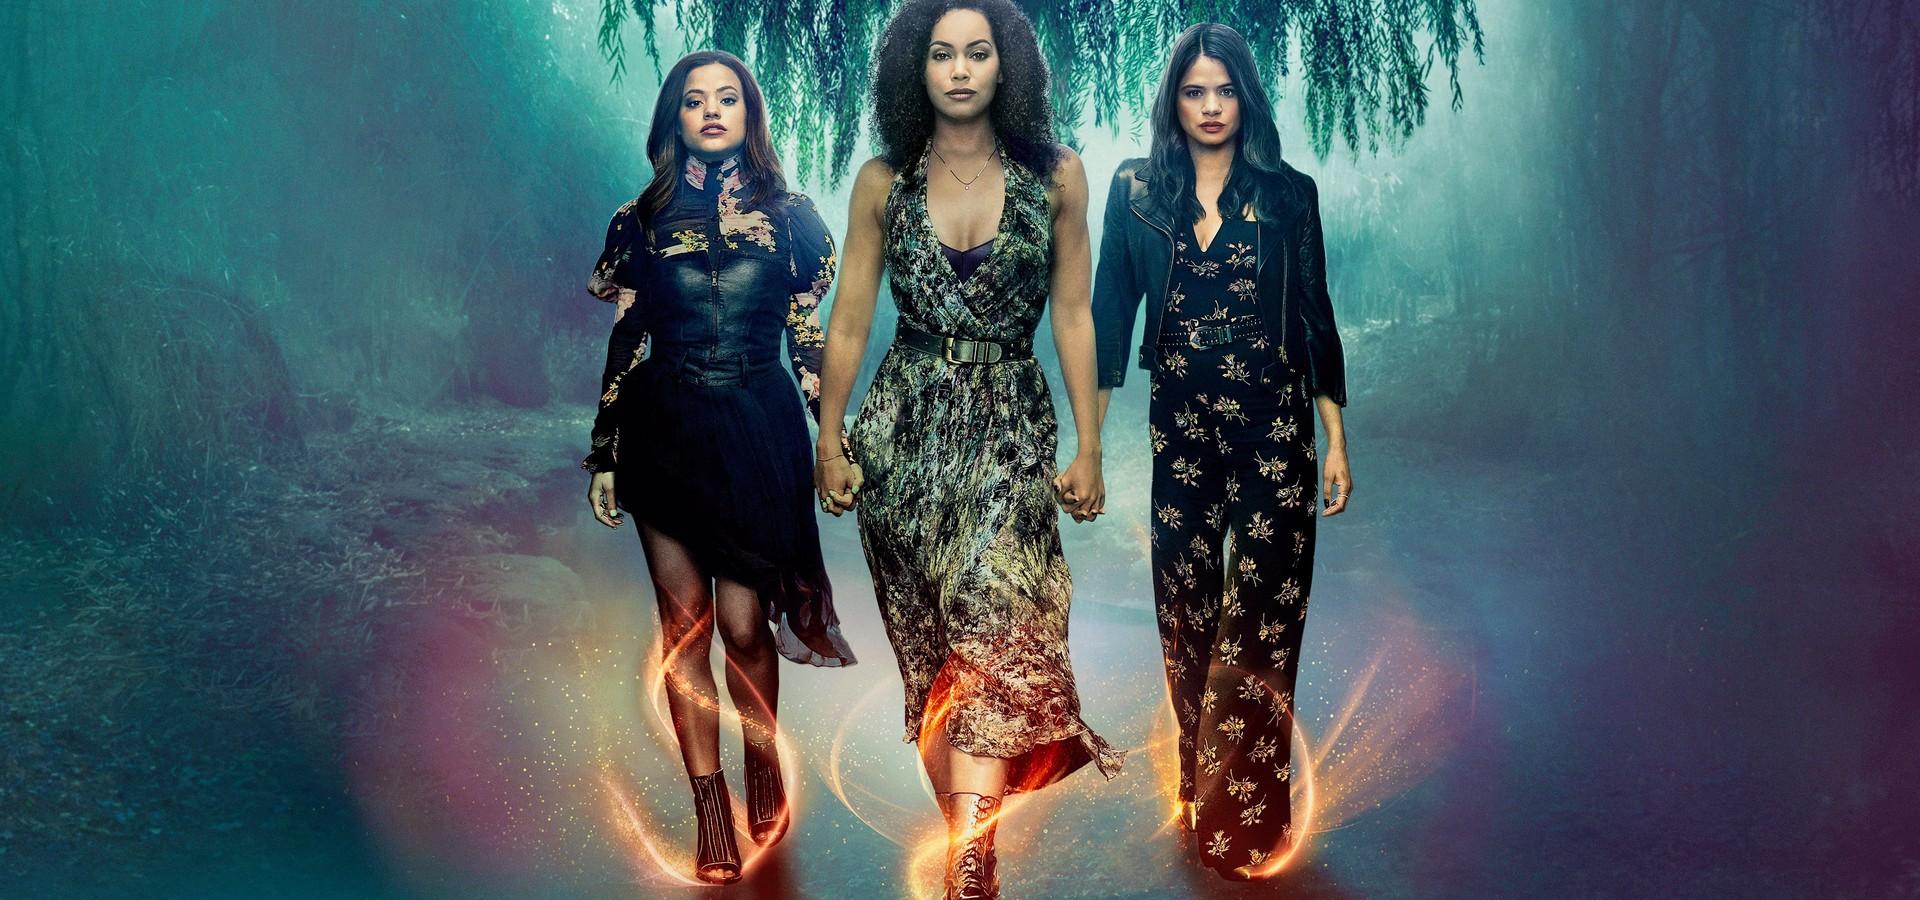 Charmed (2018) - Salto